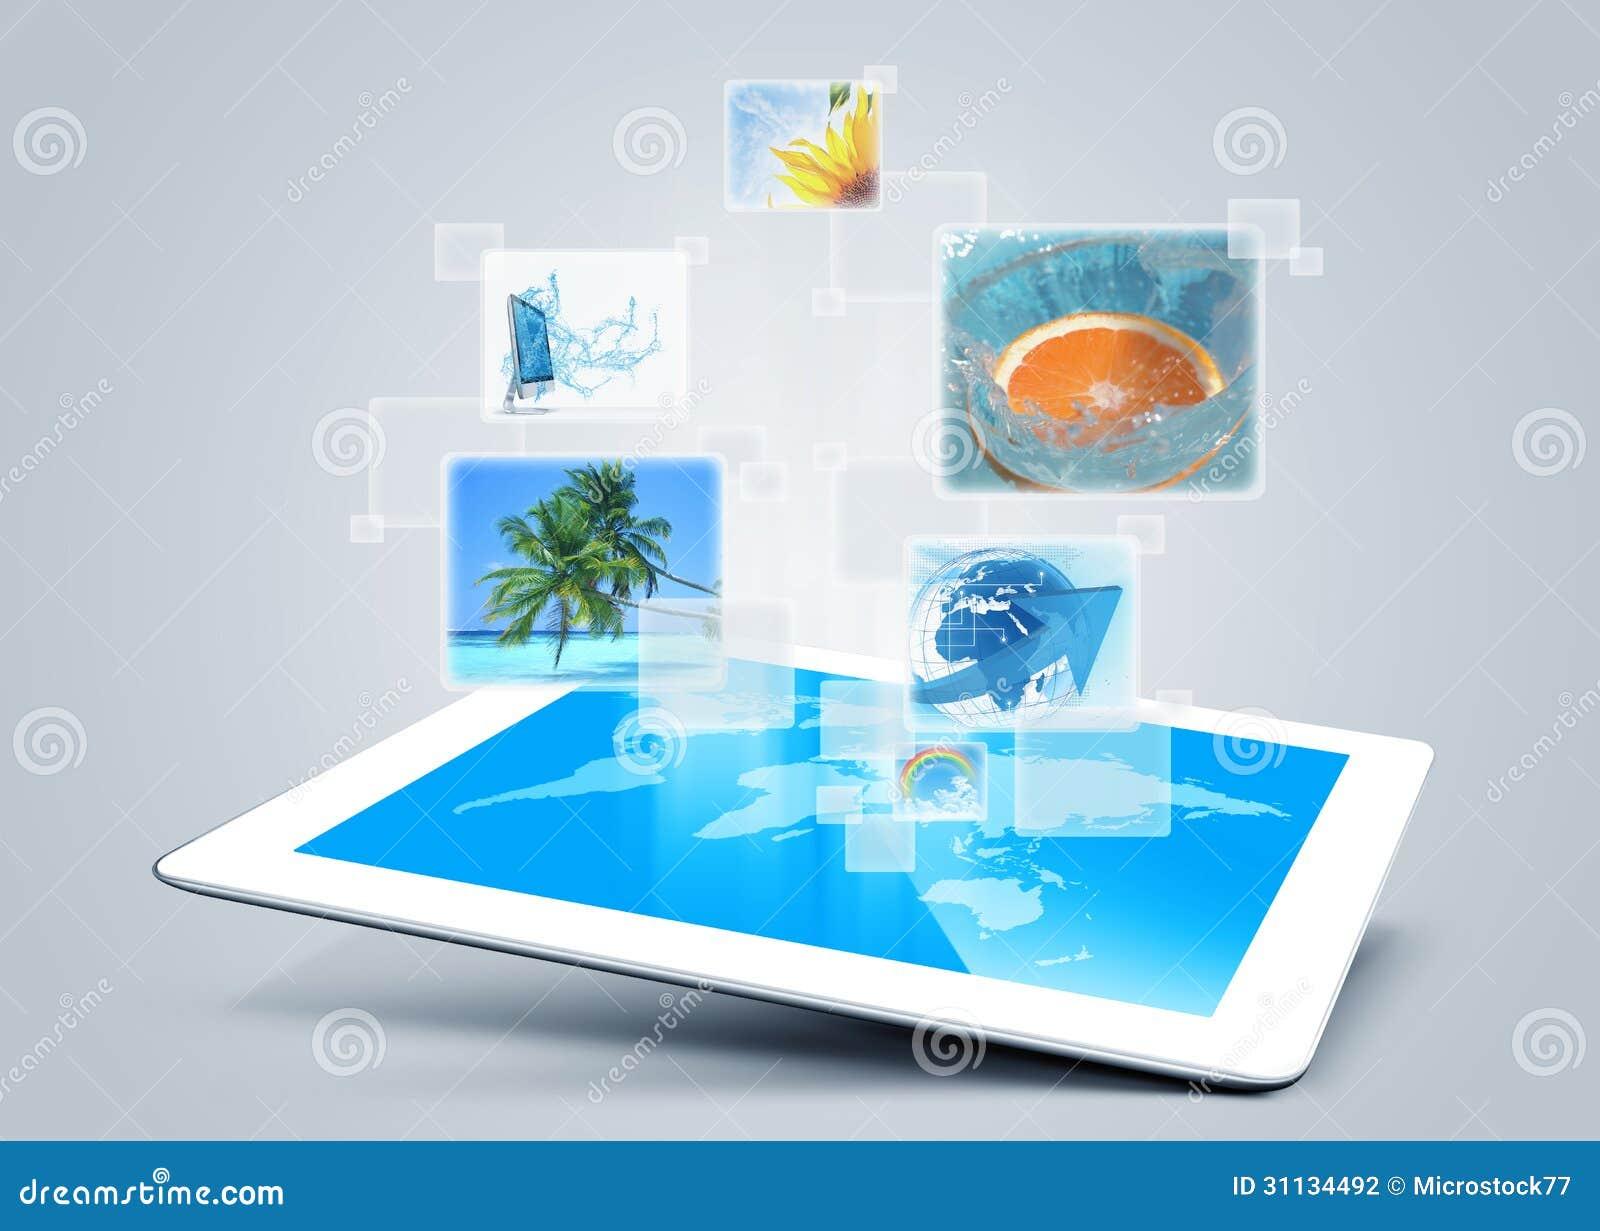 Tablet tecnology background